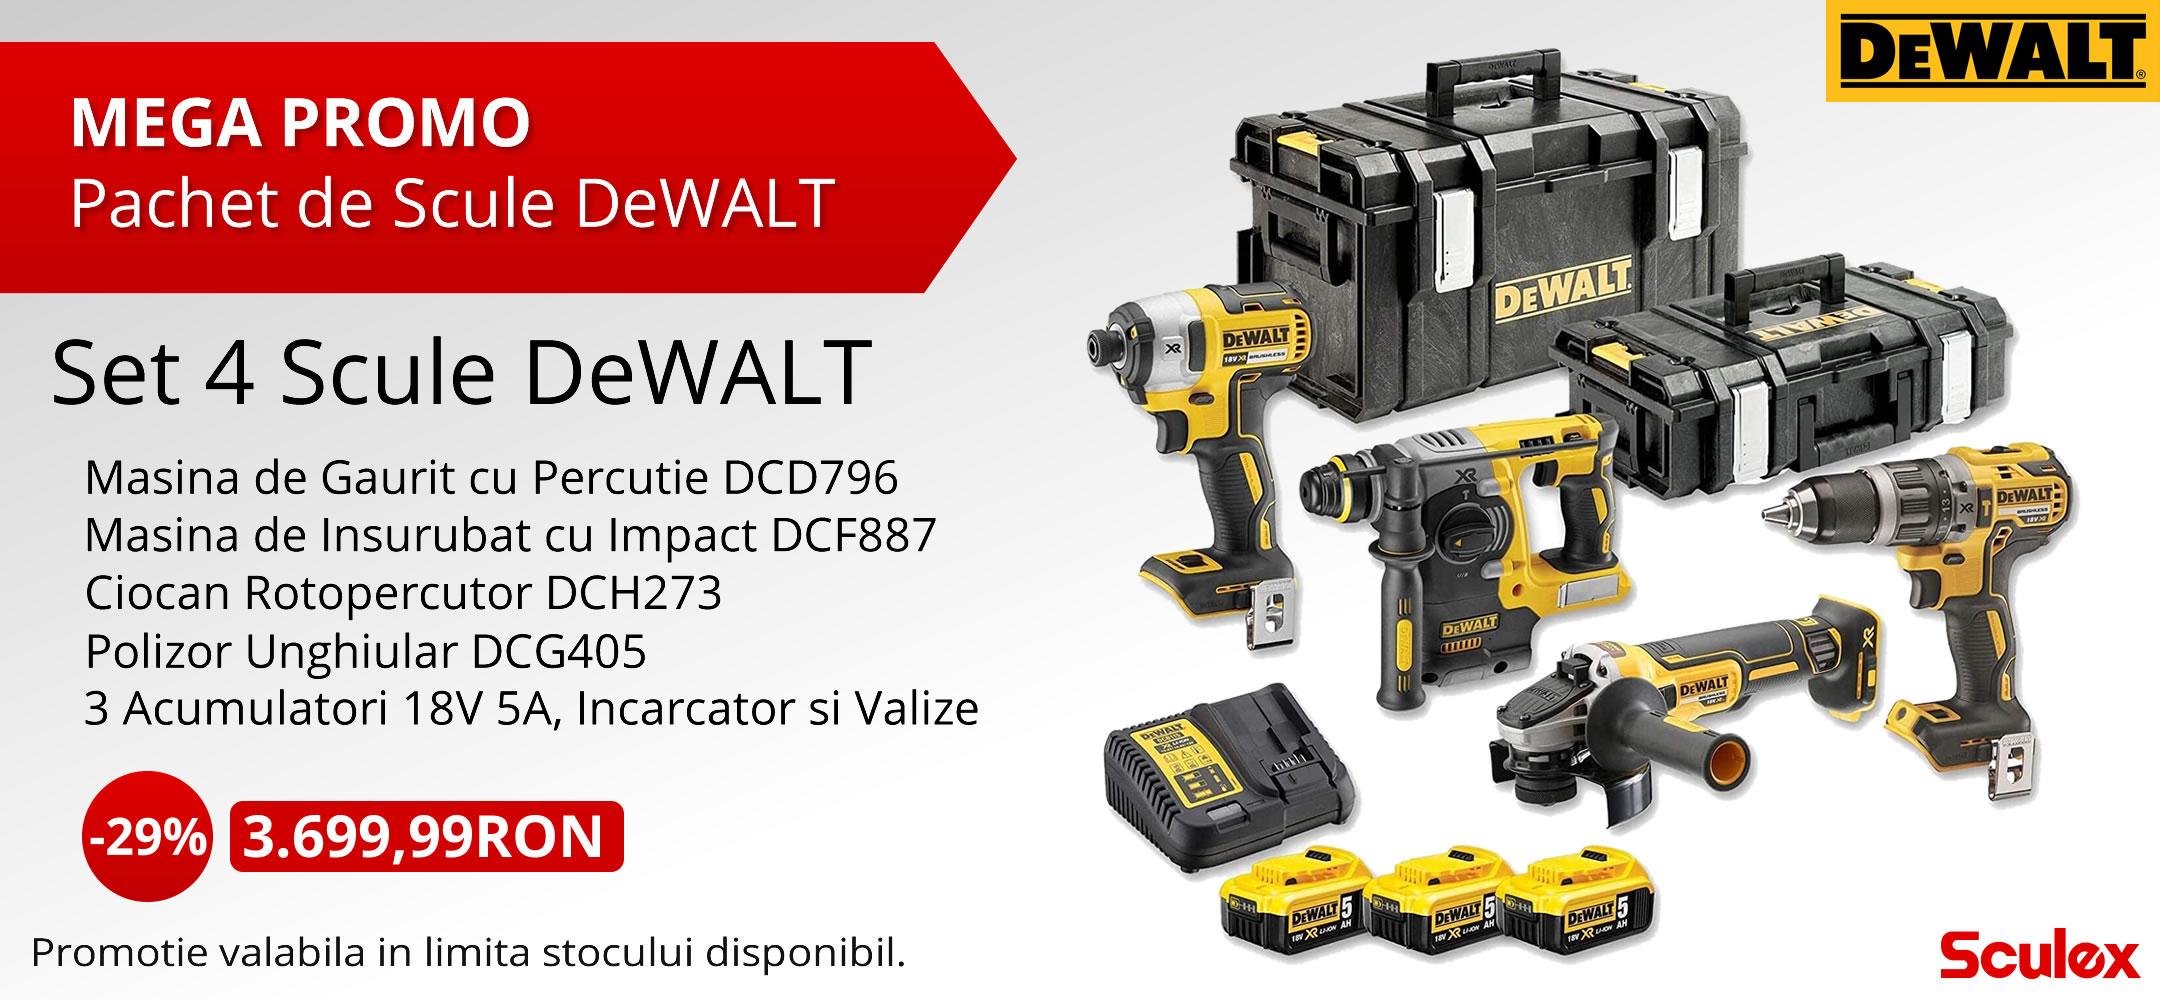 Pachet DeWALT mobile